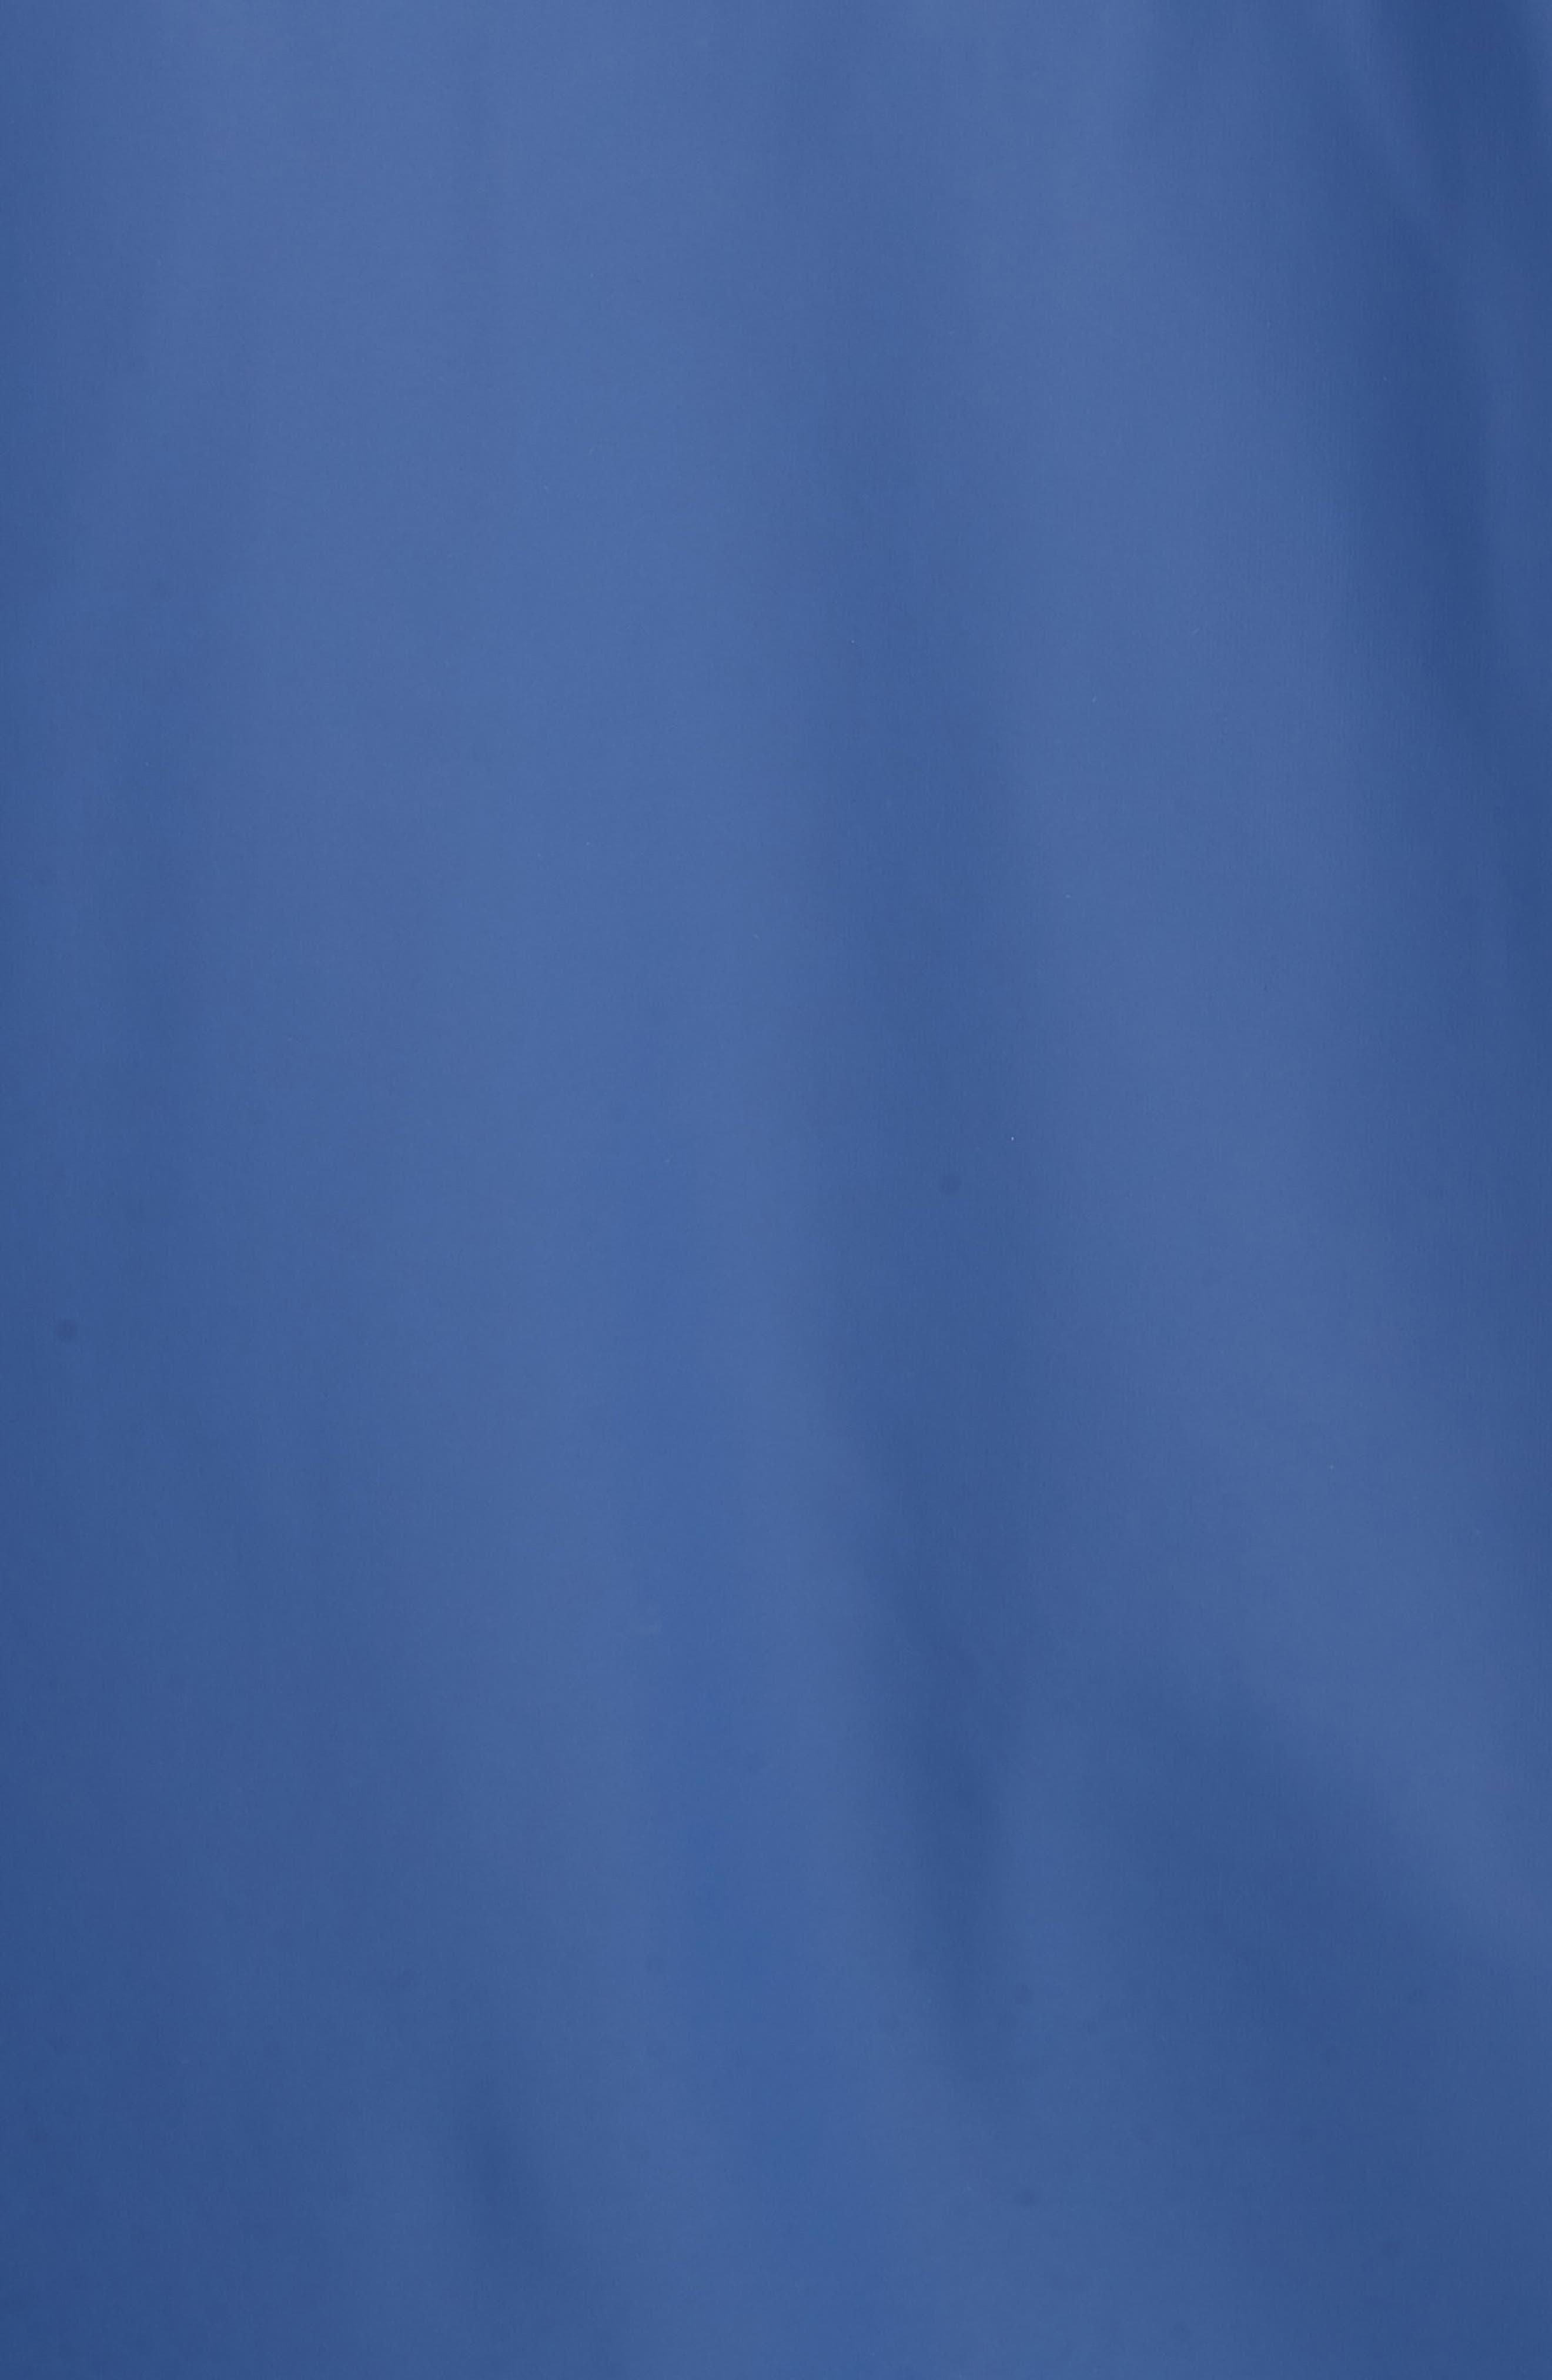 Rubberized Long Coach's Jacket,                             Alternate thumbnail 5, color,                             Navy